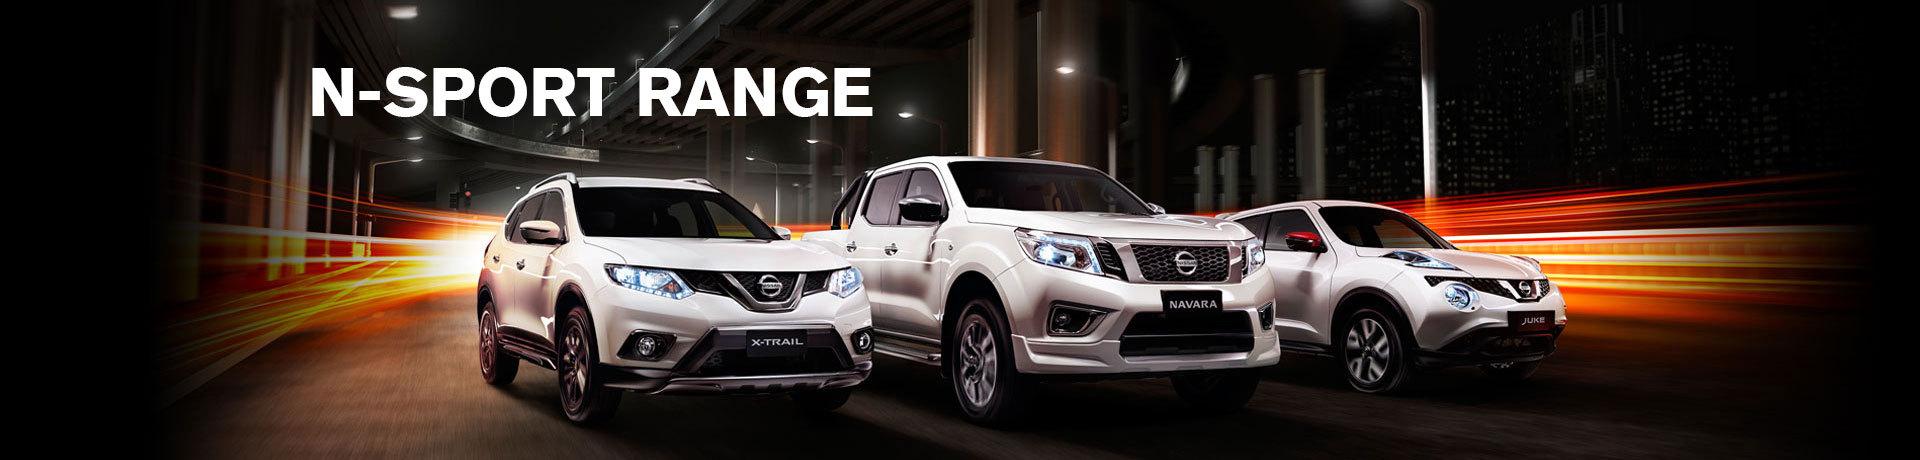 Nissan N-sport Range